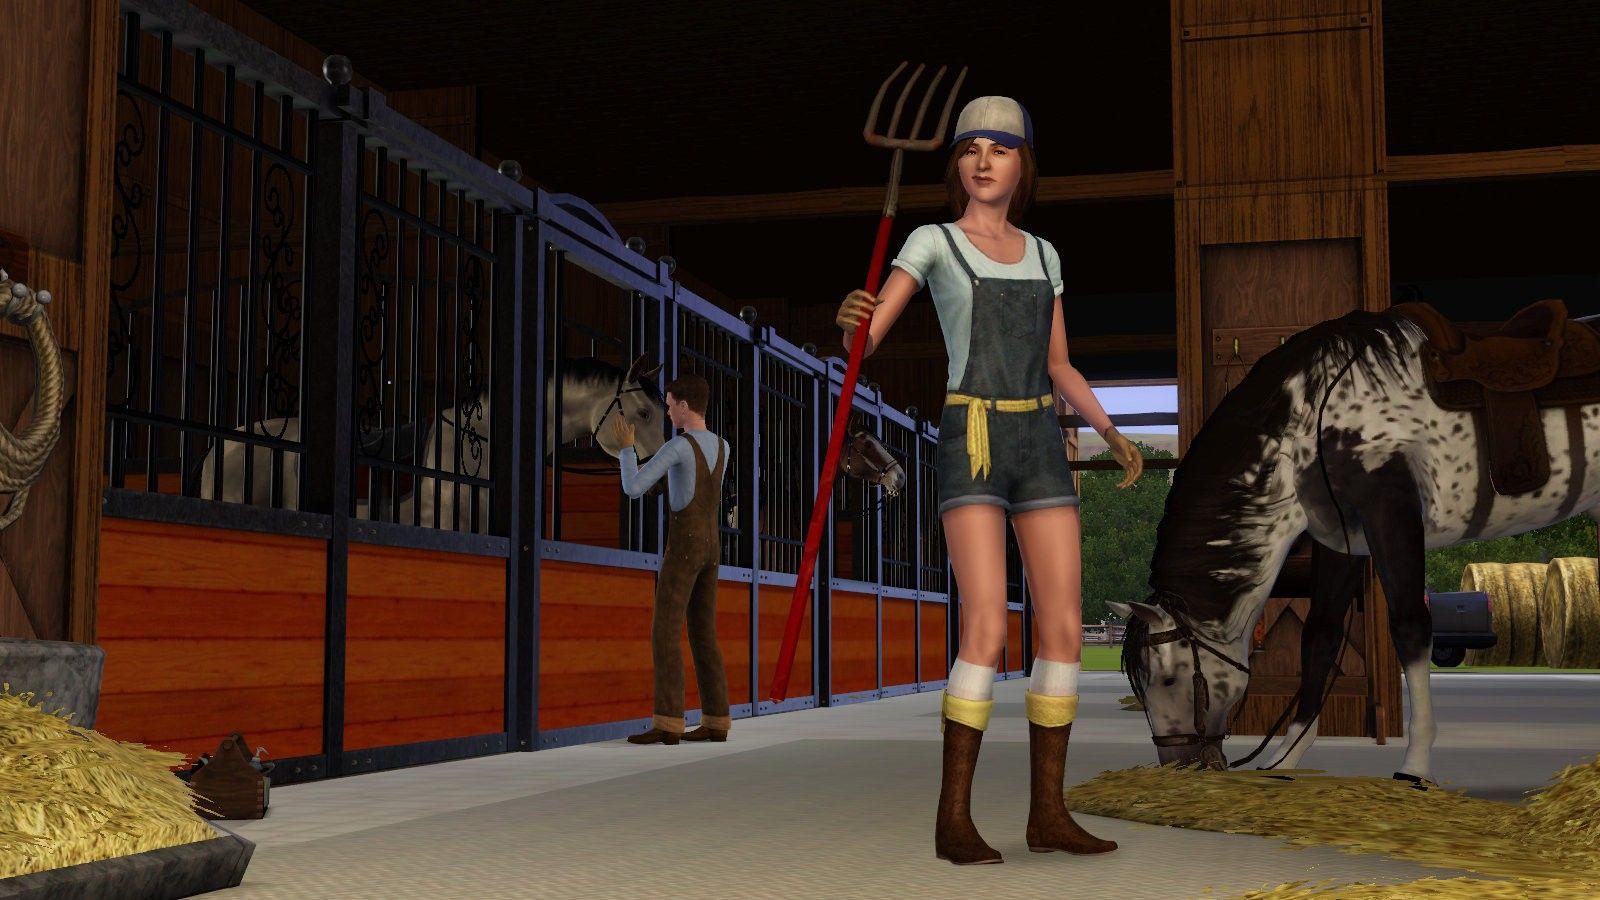 Pin en Sims 3